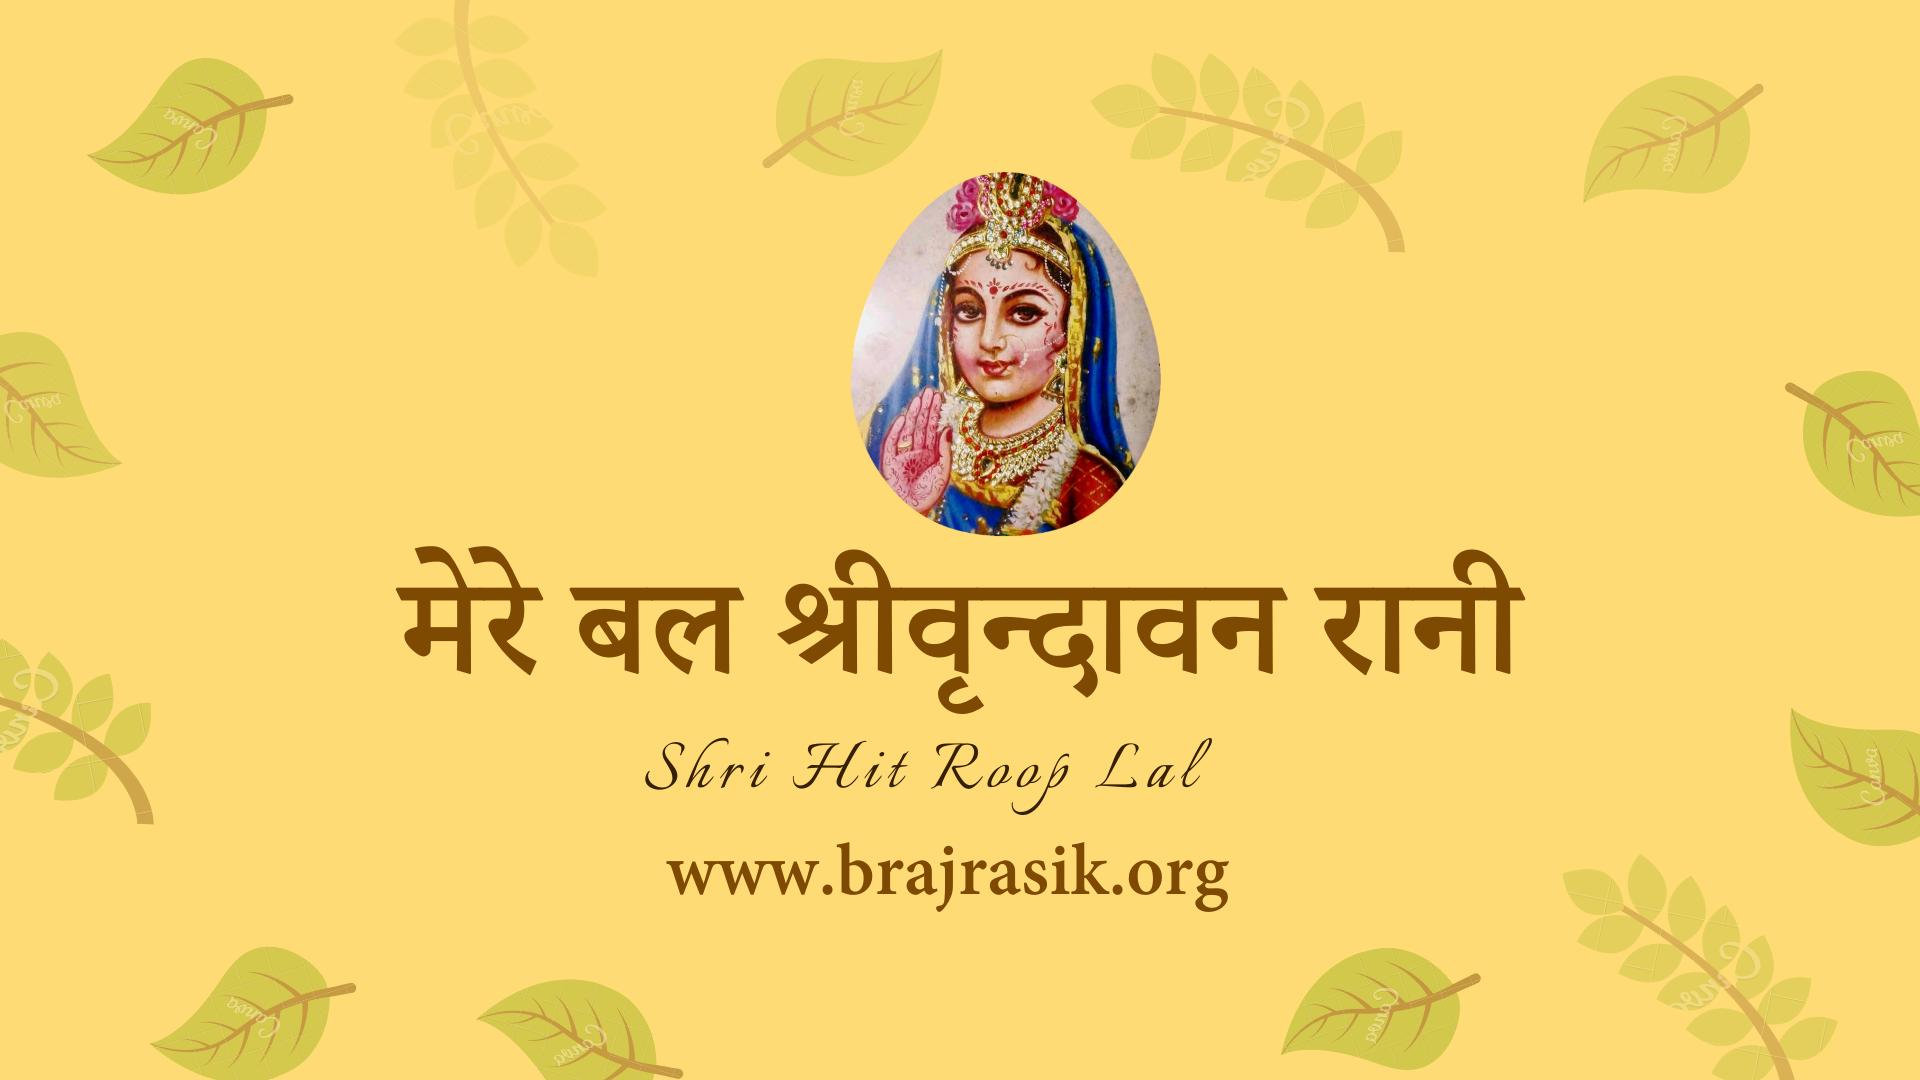 Mere Bal Shri Vrindavan Rani